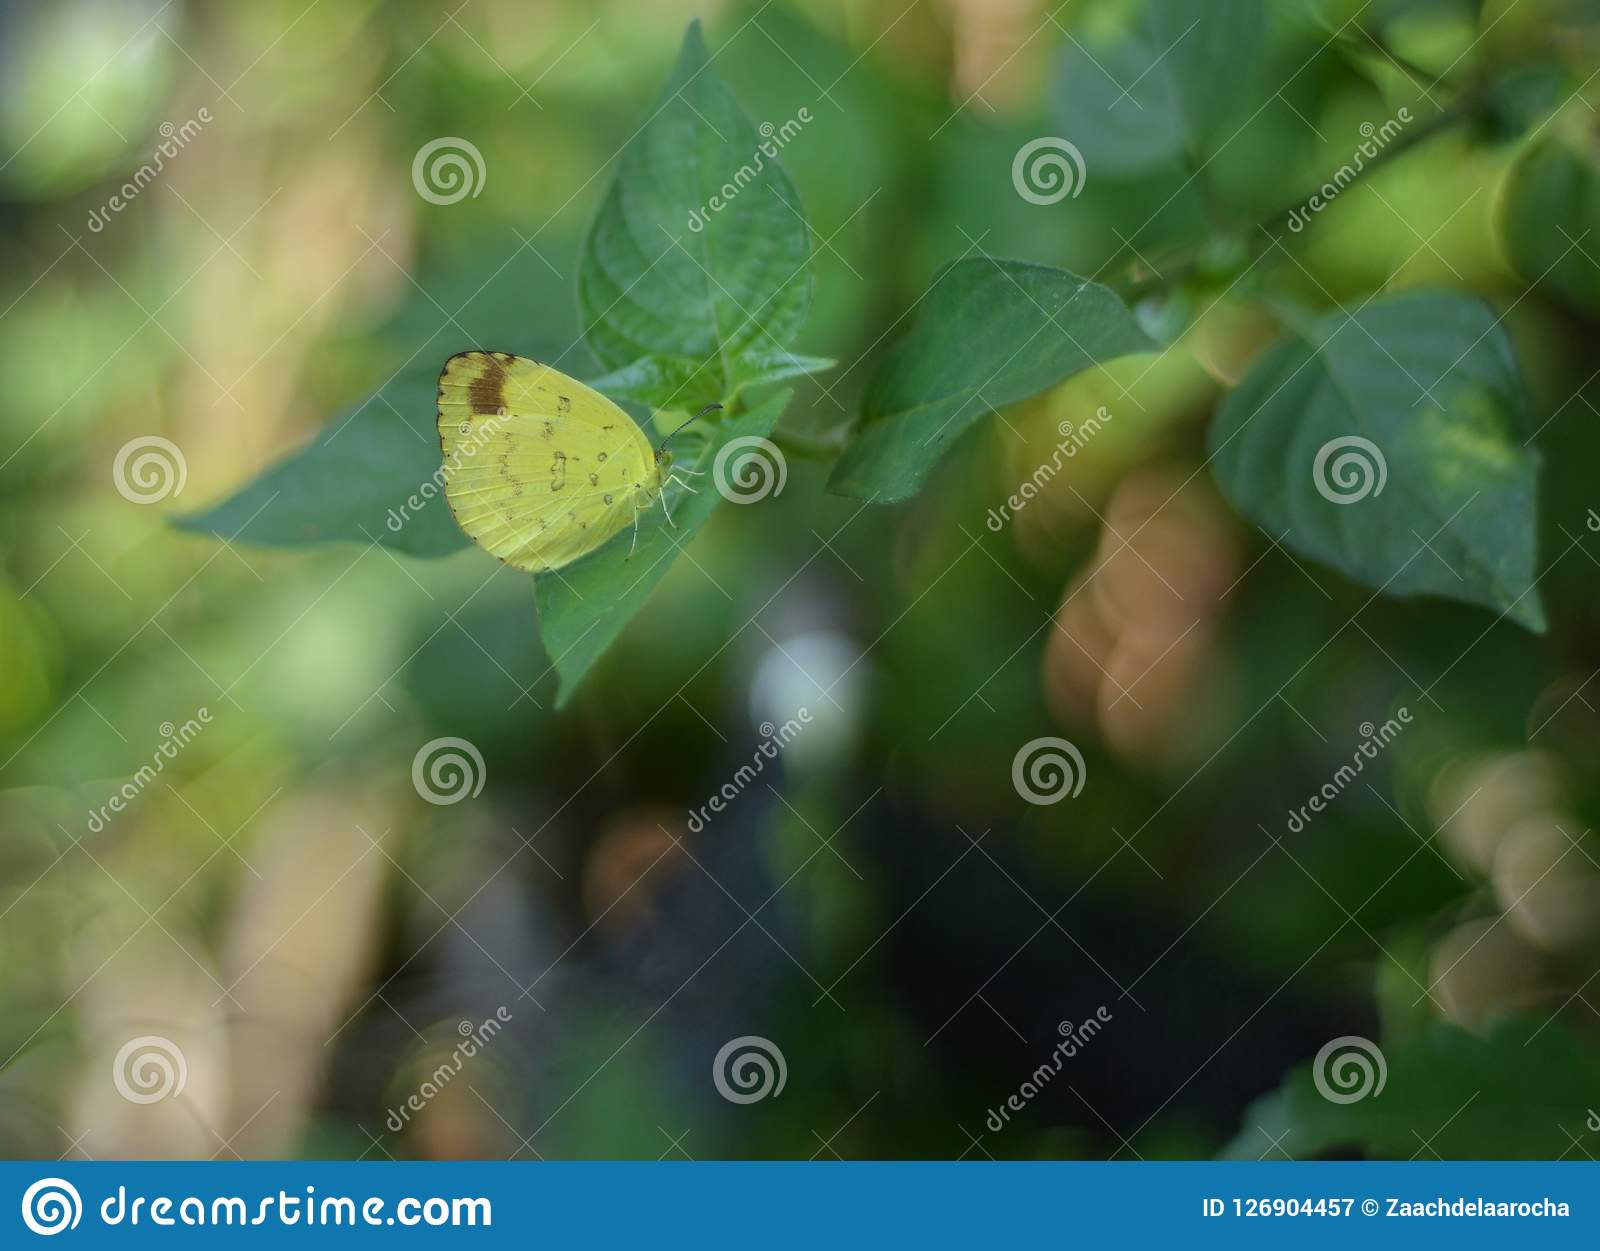 Сонная оранжевая бабочка на зеленых лист